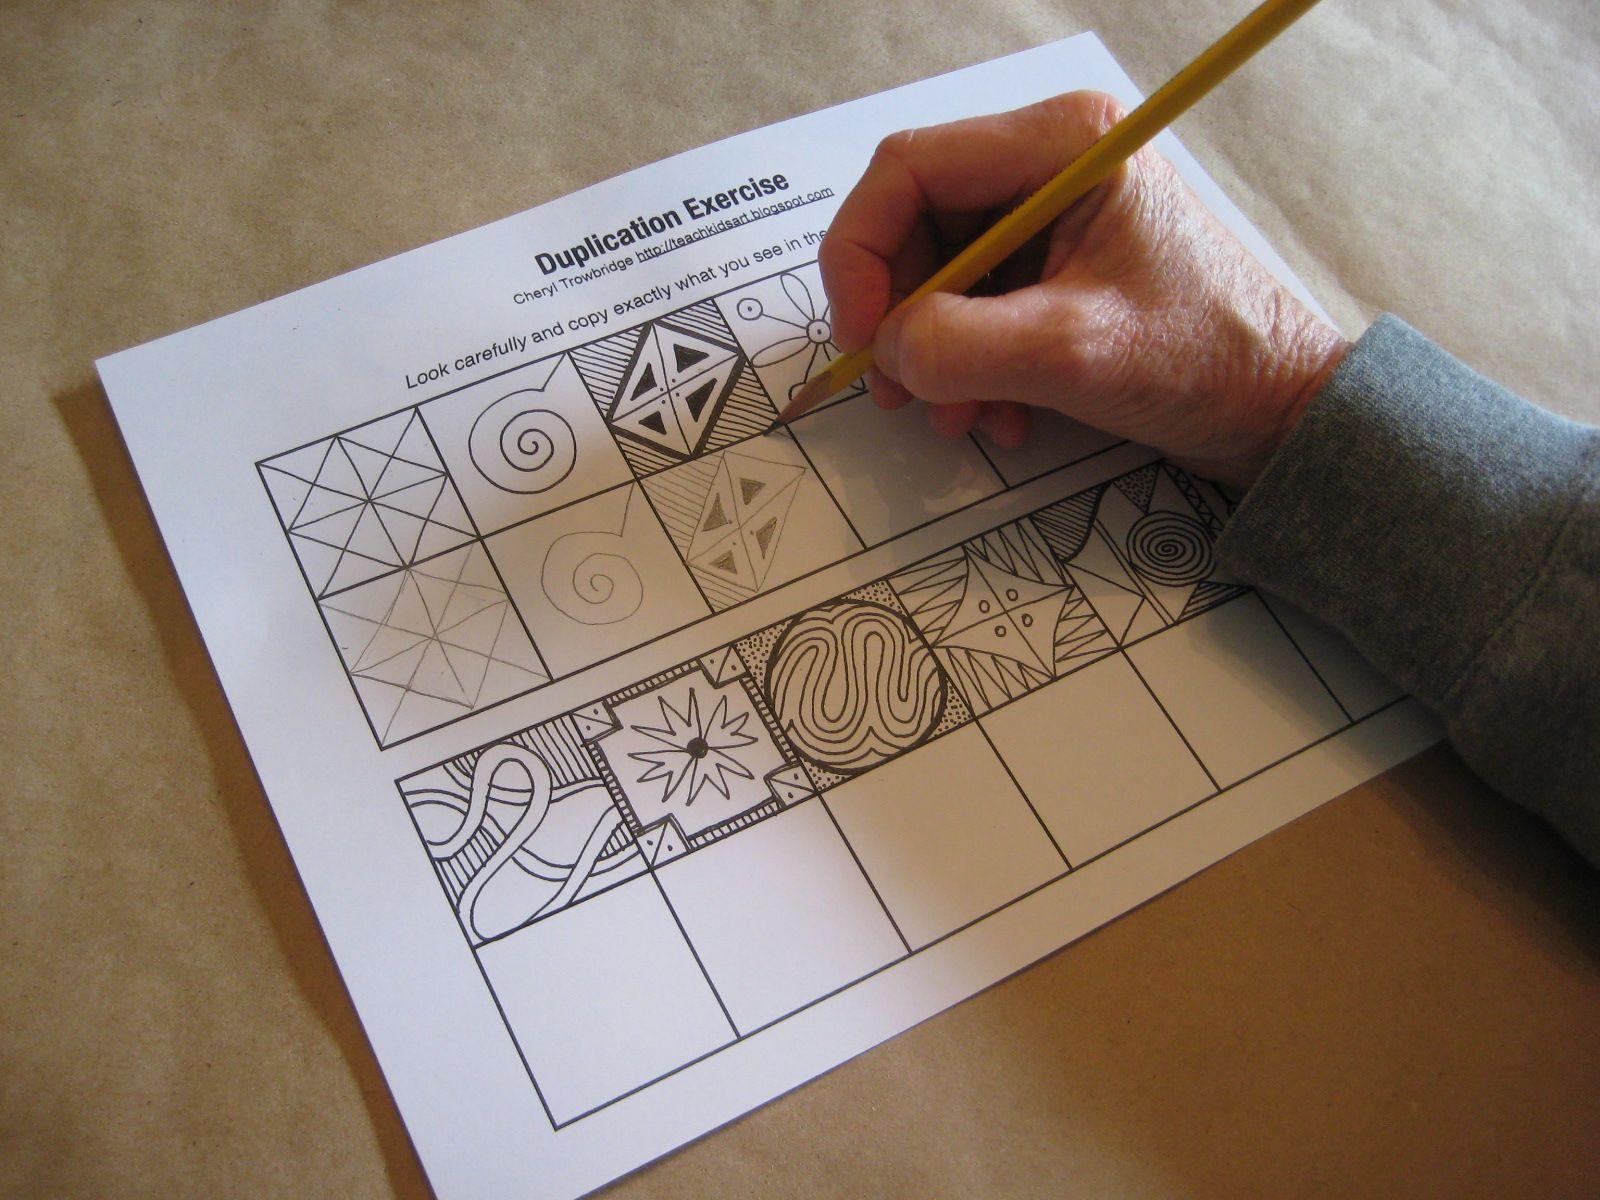 Duplication Exercise Based On Mona Brooks Drawing With